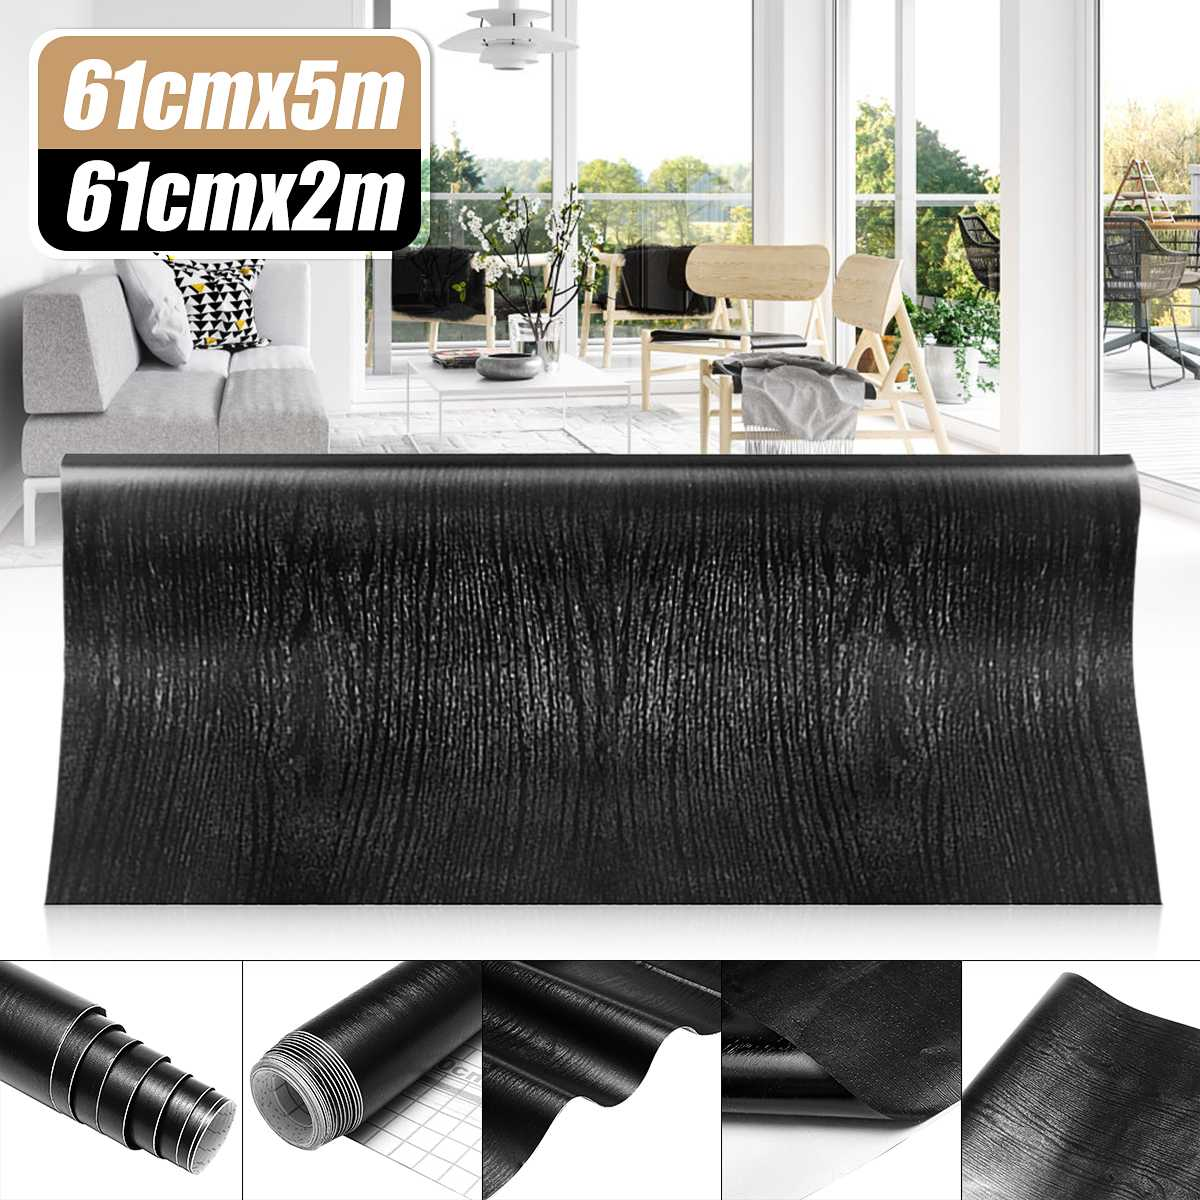 Black Wood Grain Wallpaper Wall Stickers Films Refurbished Wardrobe Kitchen Clothes Cupboard Door Desktop Furniture Home Decor